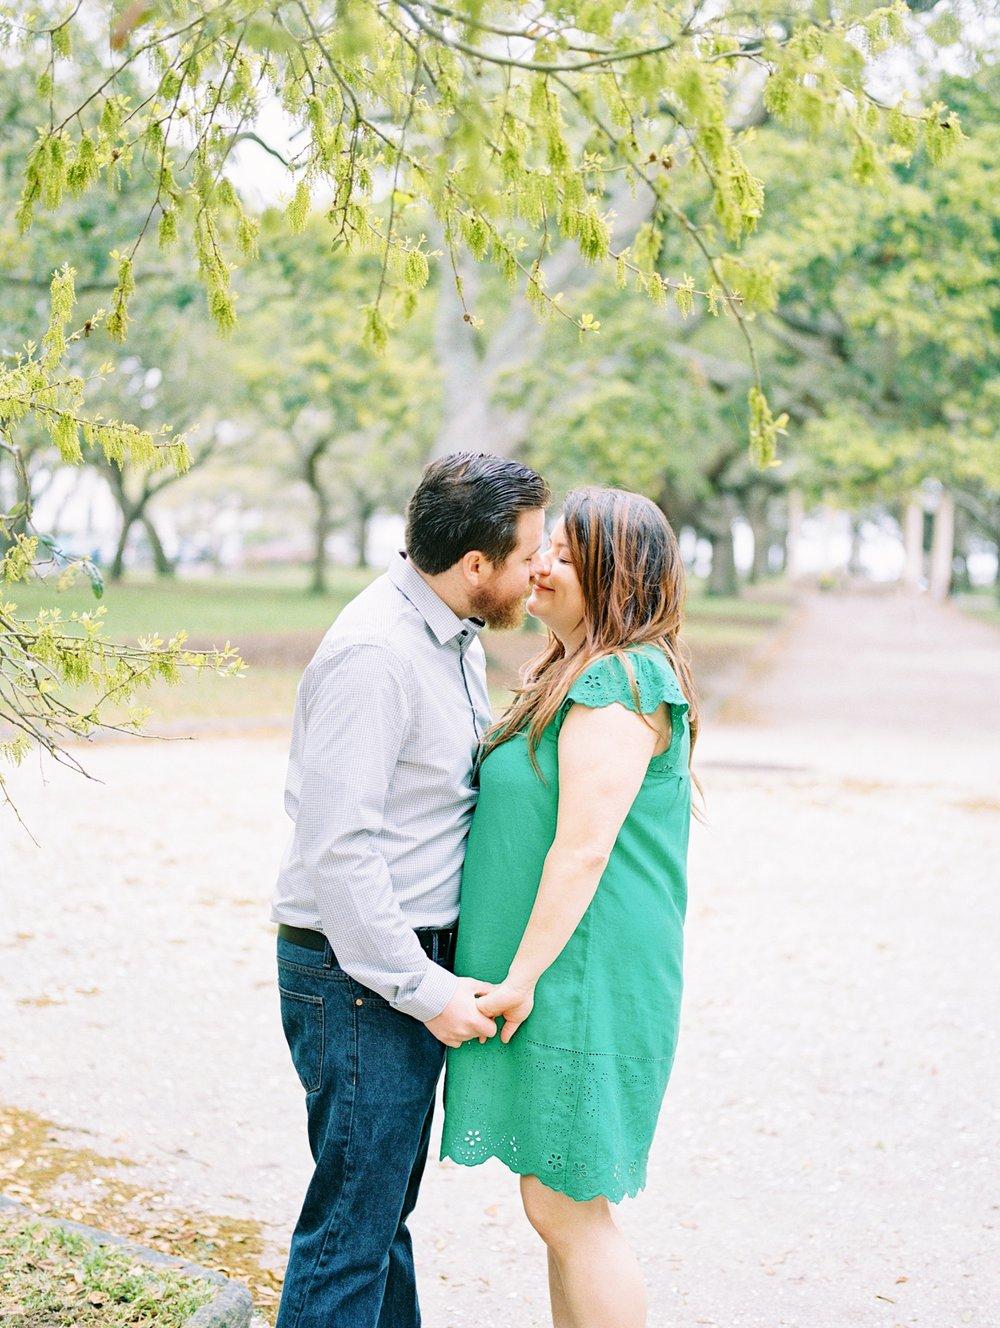 Lisa Silva Photography- Ponte Vedra Beach and Jacksonville, Florida Fine Art Film Wedding Photography- Engagement Session in Historic Charleston, South Carolina_0014.jpg